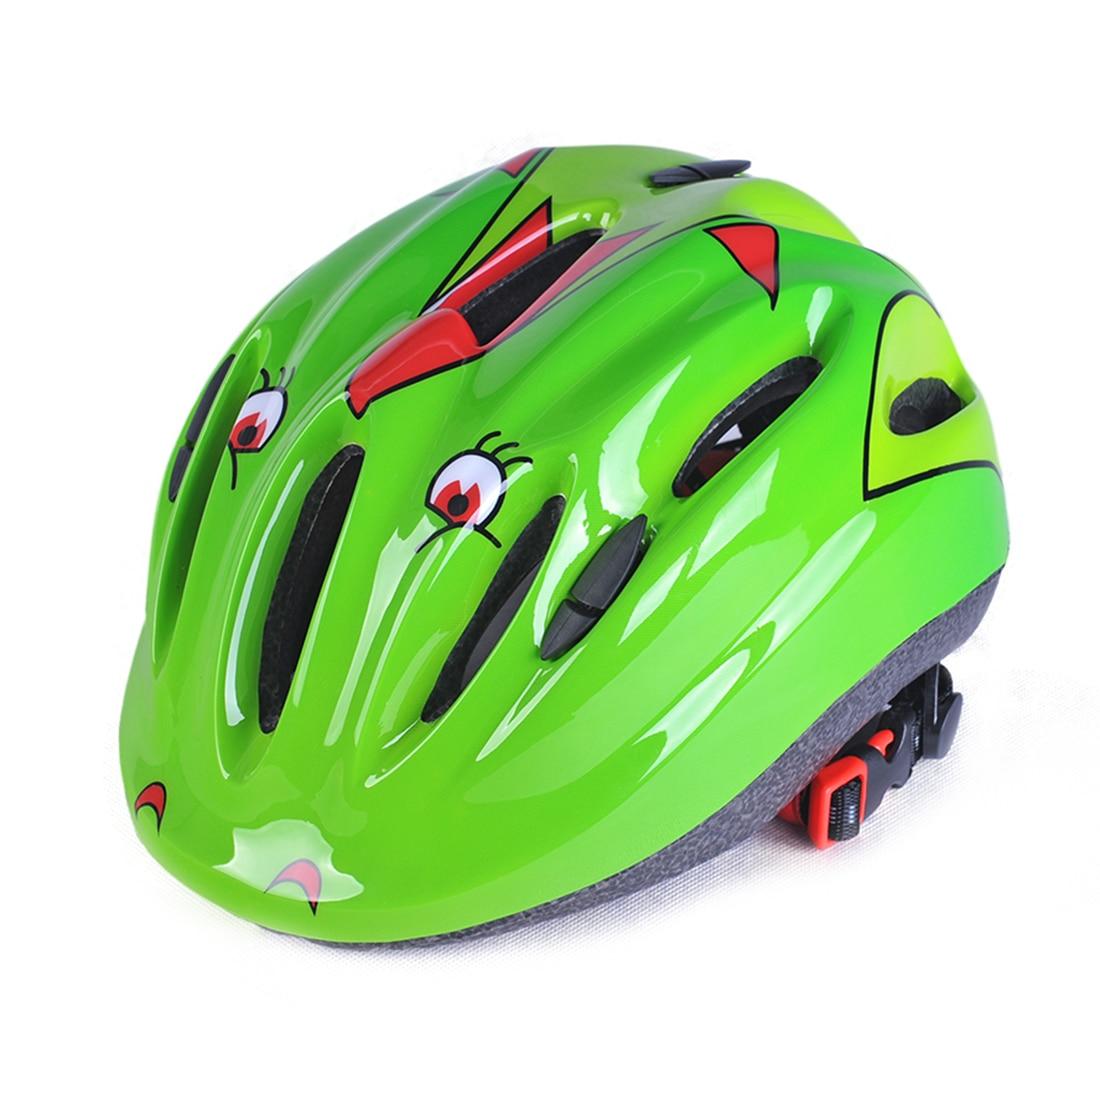 Unikid Safety Mountain Bike Bicycle Helmet Cycling